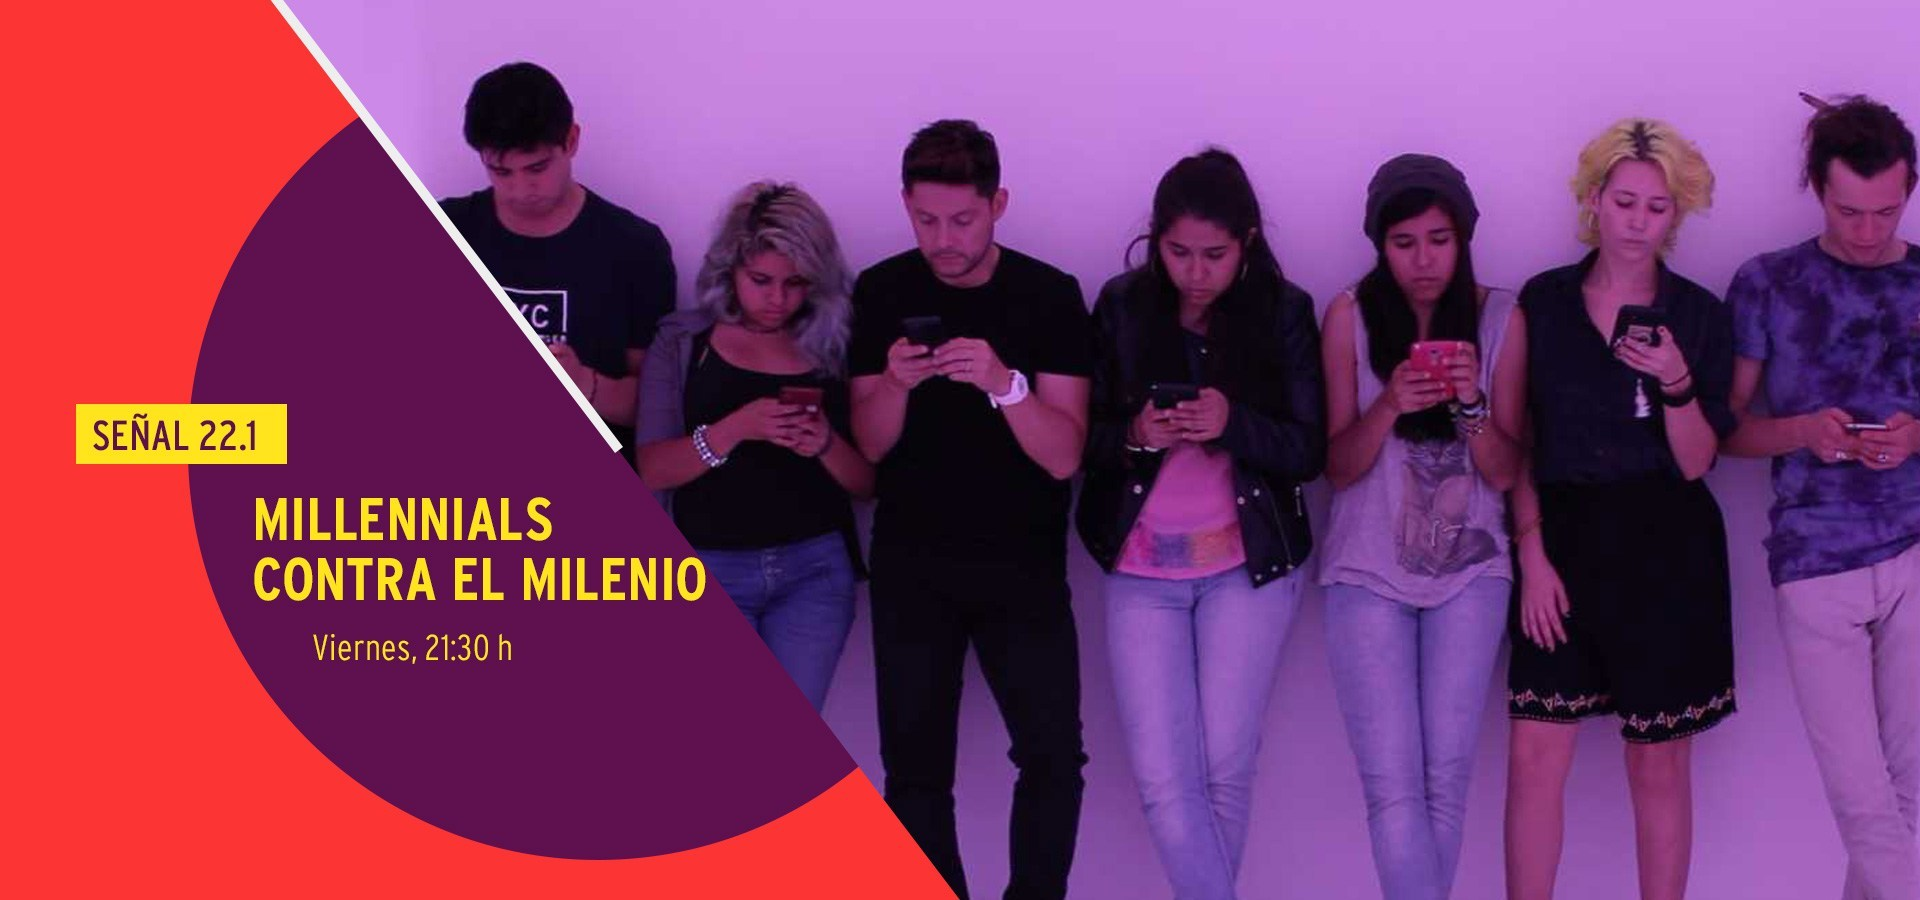 Canal 22 devela quiénes son los milennials